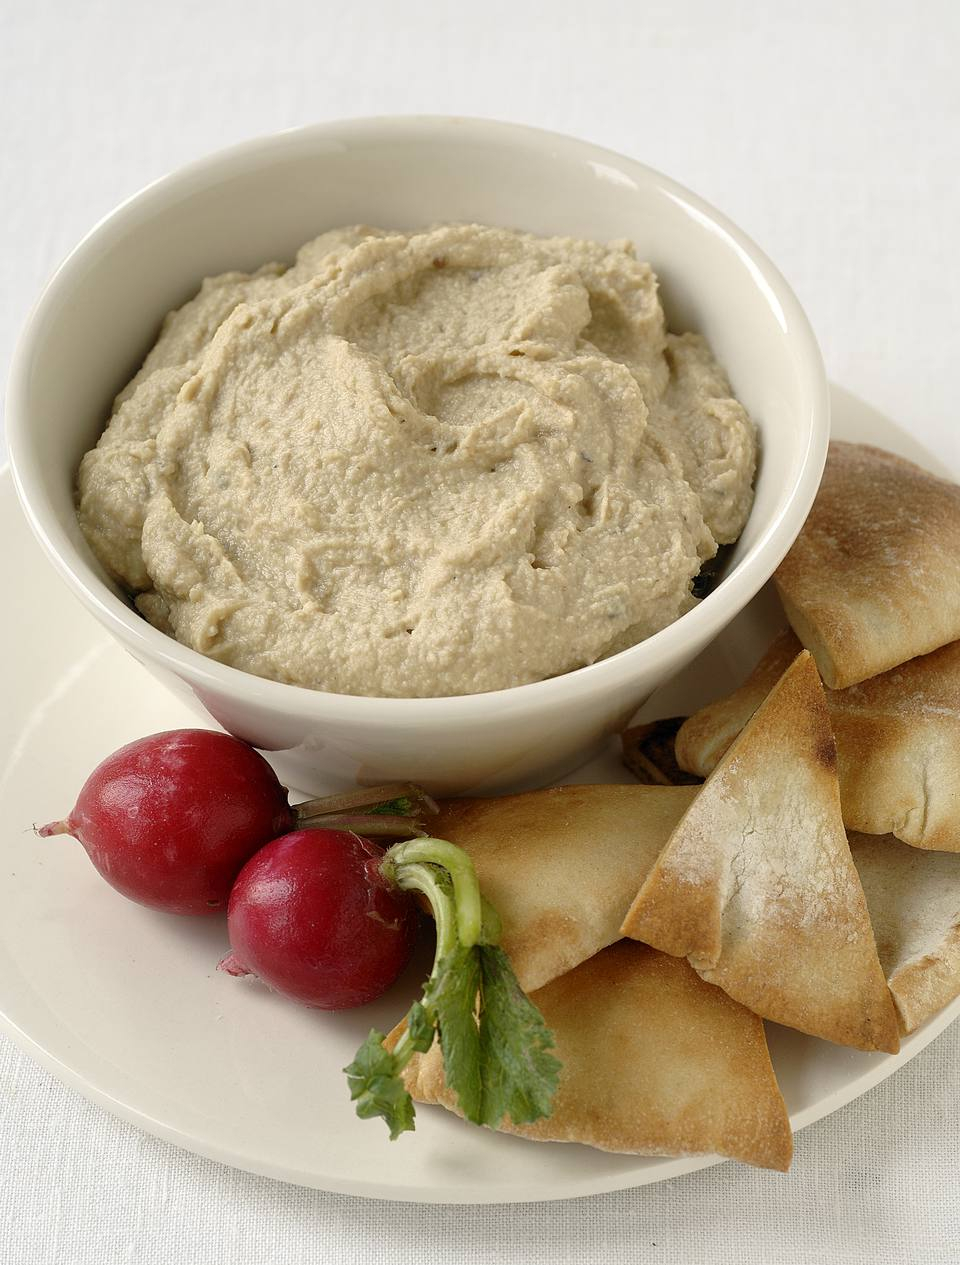 Bowl of Hummus with Pita Points & Radishes